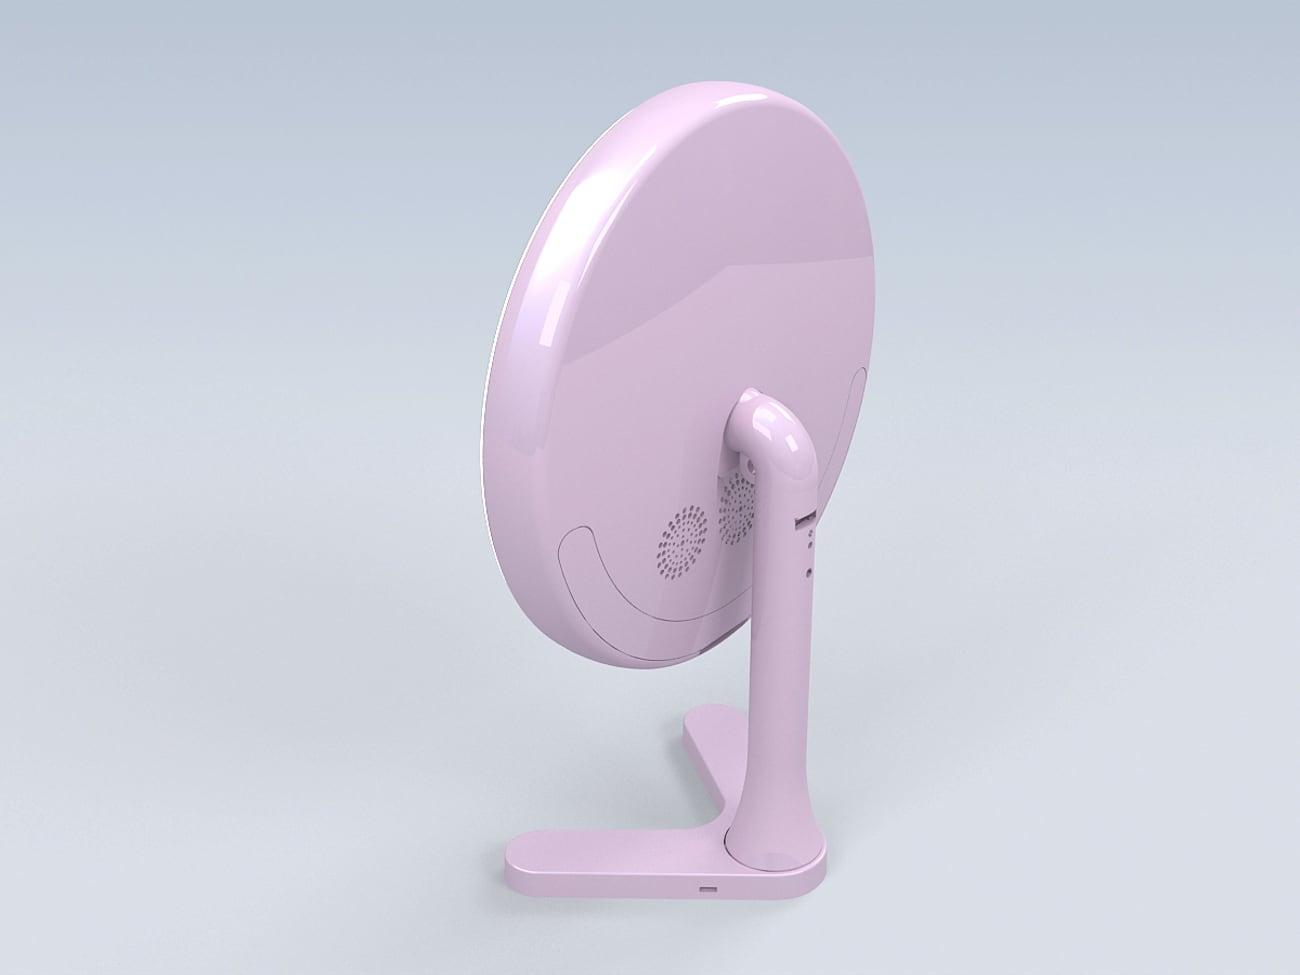 Shezmirror Smart Skincare Mirror